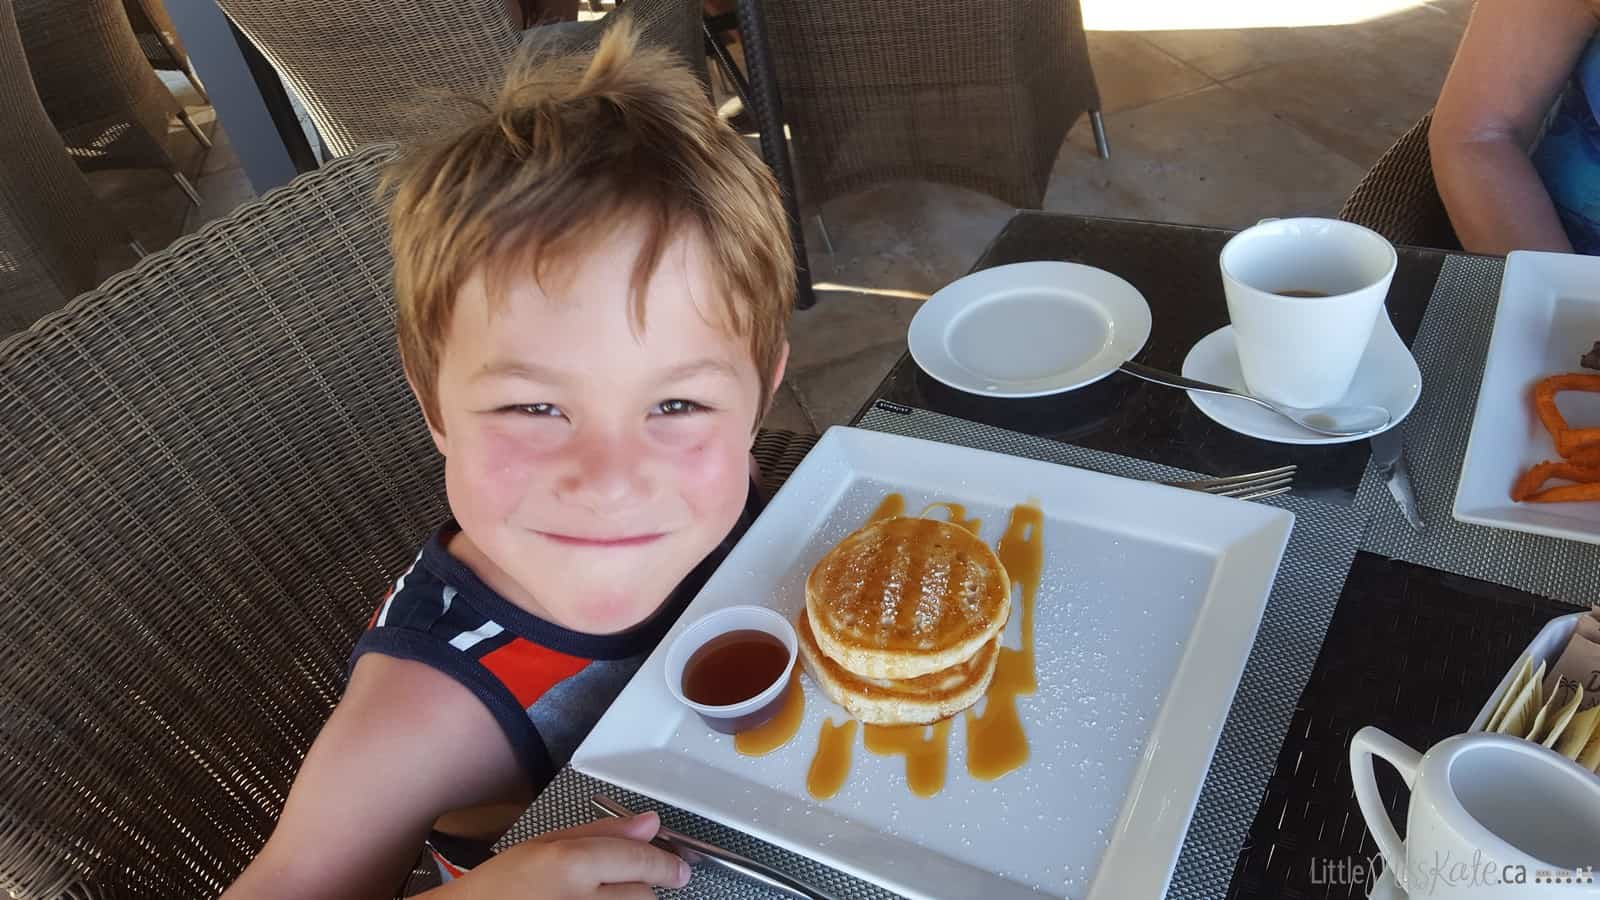 Beaches Resort Villages Turks and Caicos Restaurants - Neptunes via littlemisskate.ca